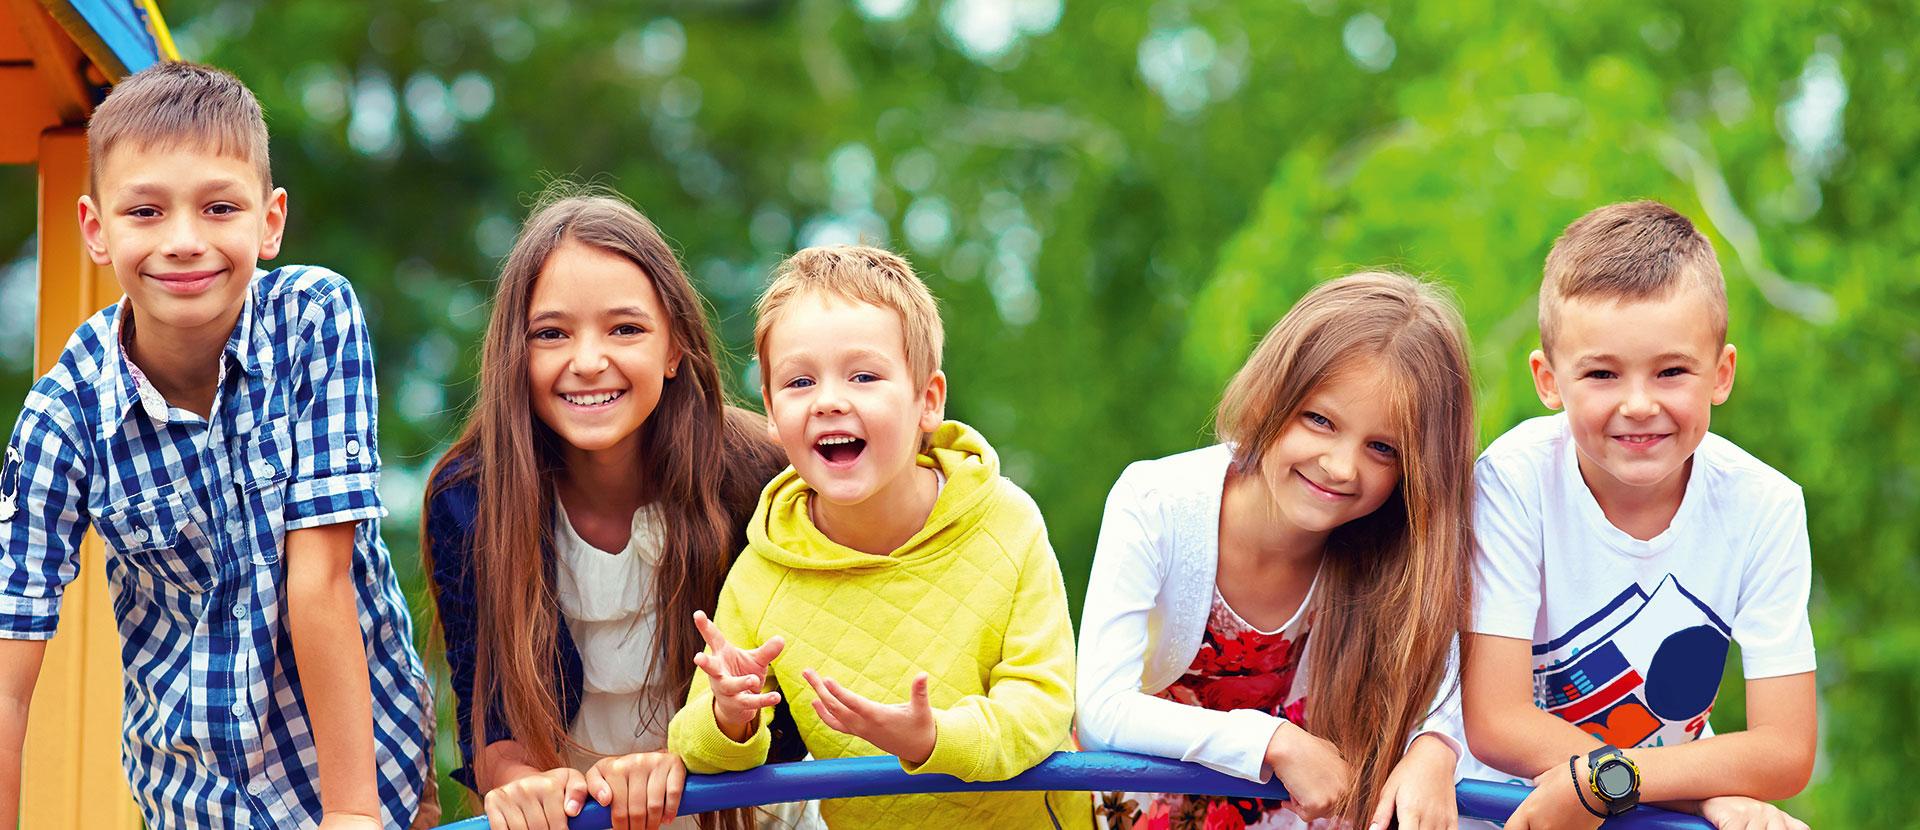 Kinderparadies - Natur- & Familienresort Der Stieglerhof in Radstadt